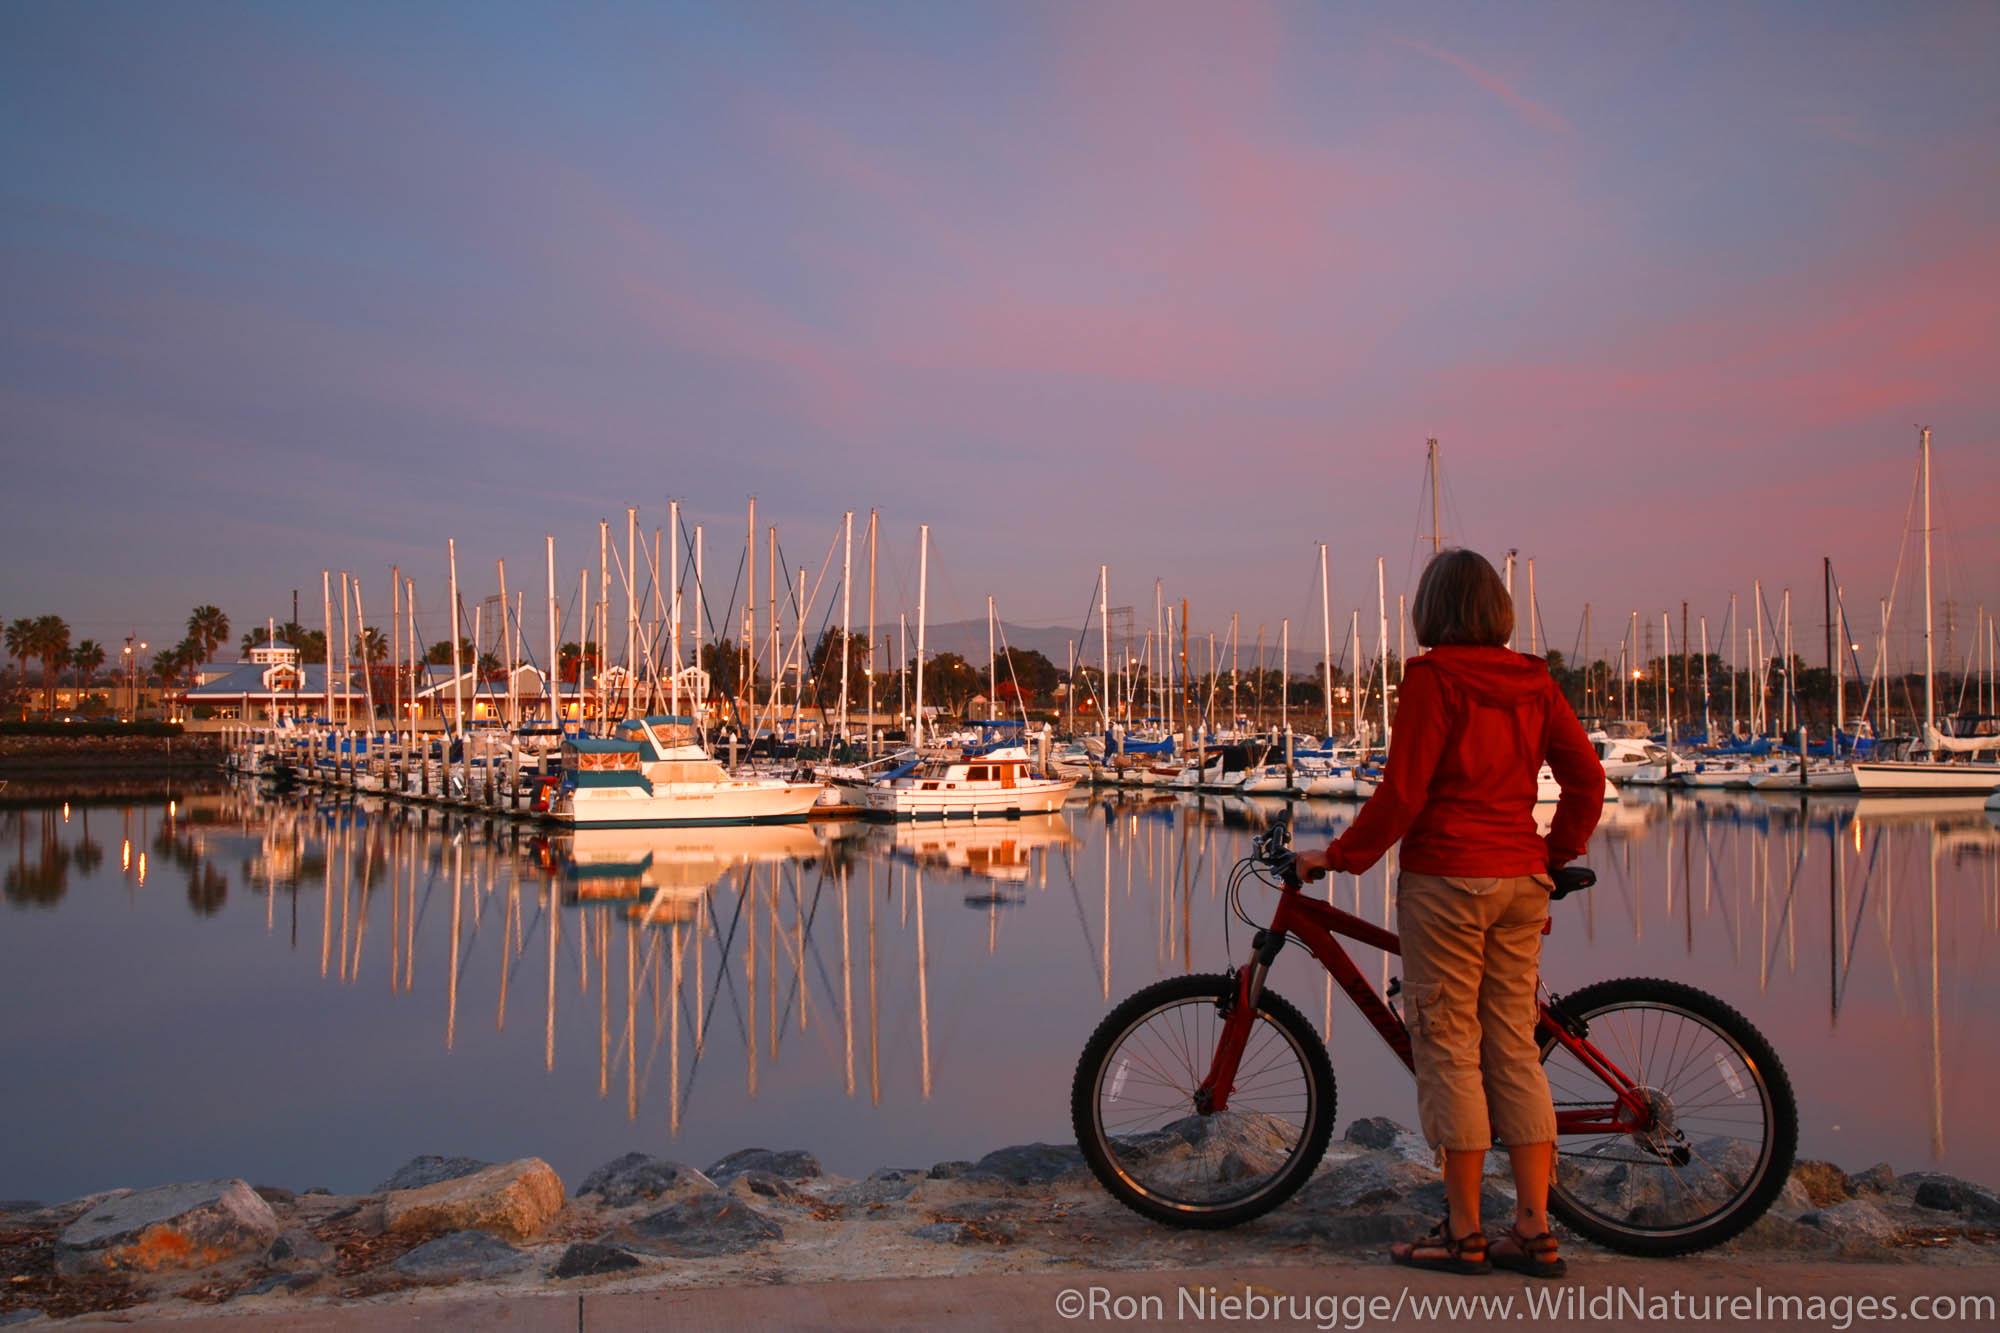 A visitor with a bike enjoys the Chula Vista Marina, Chula Vista, California.  (Model released)